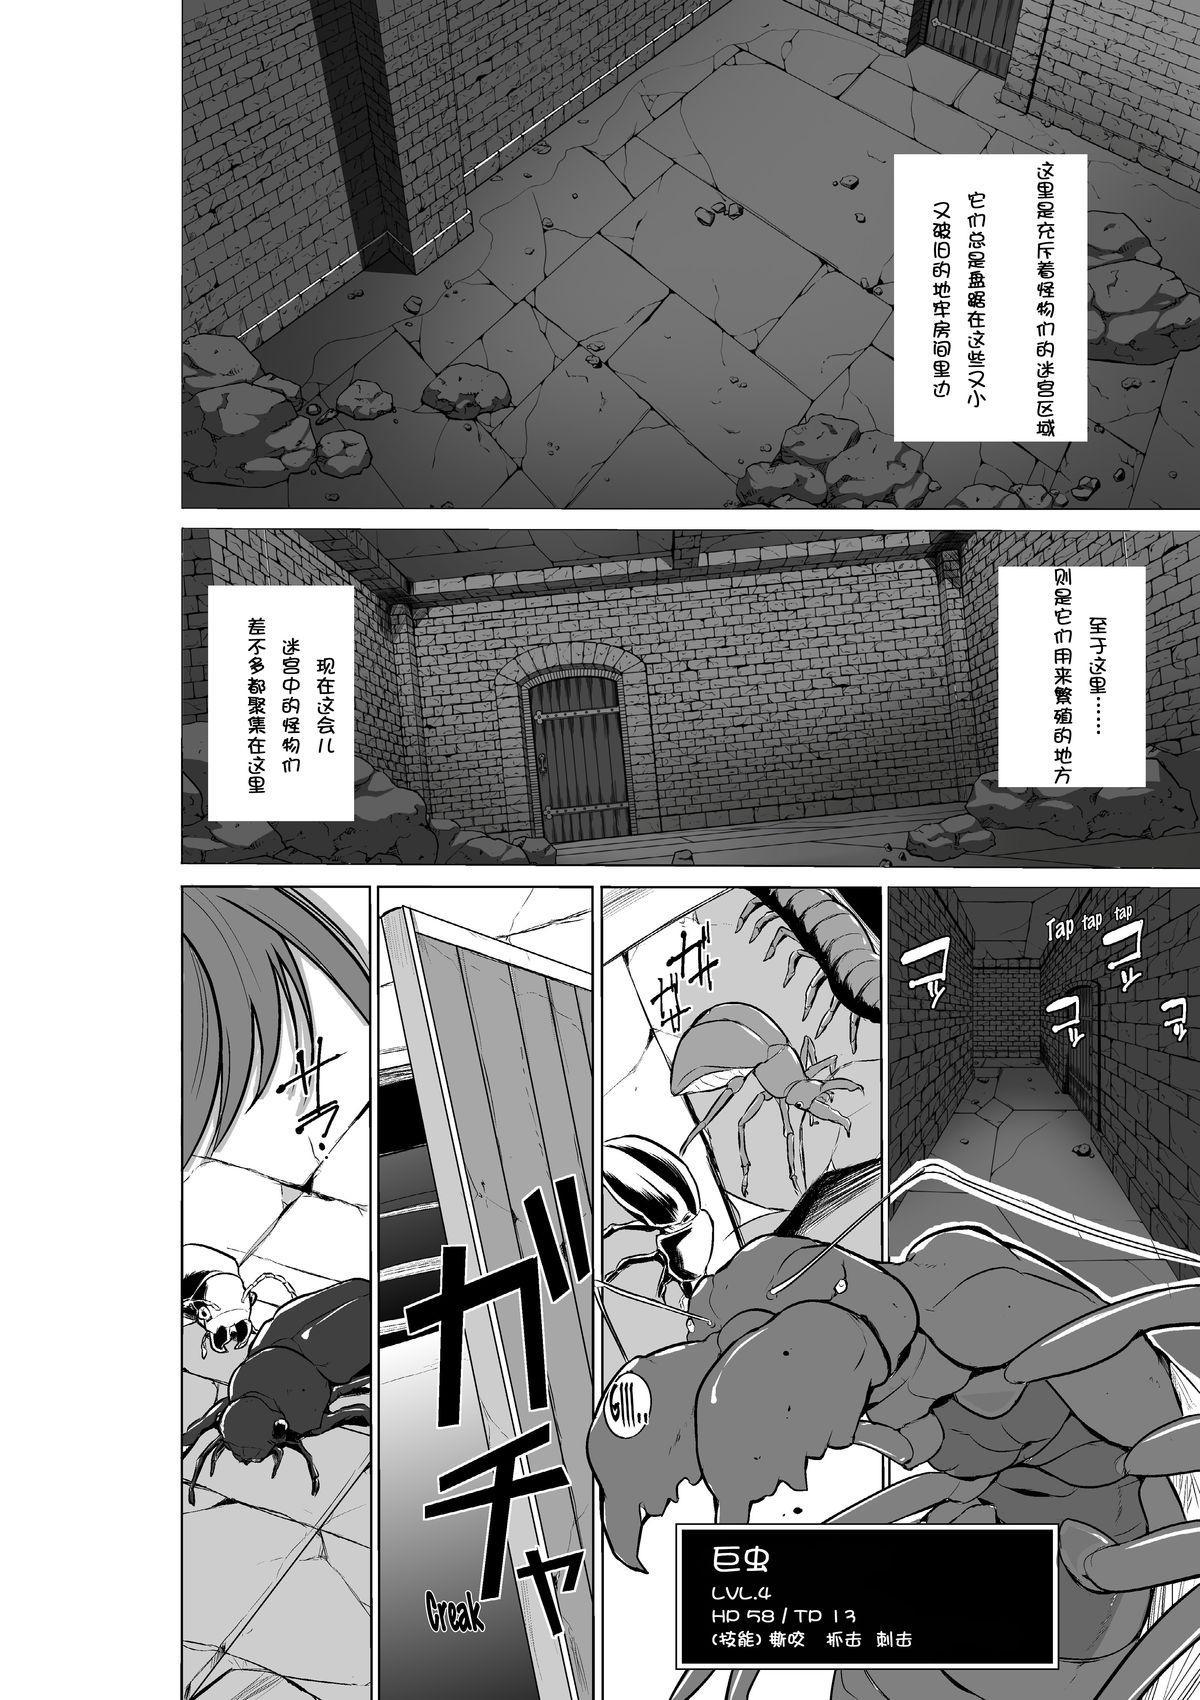 Dungeon Travelers - Manaka no Himegoto 2 2